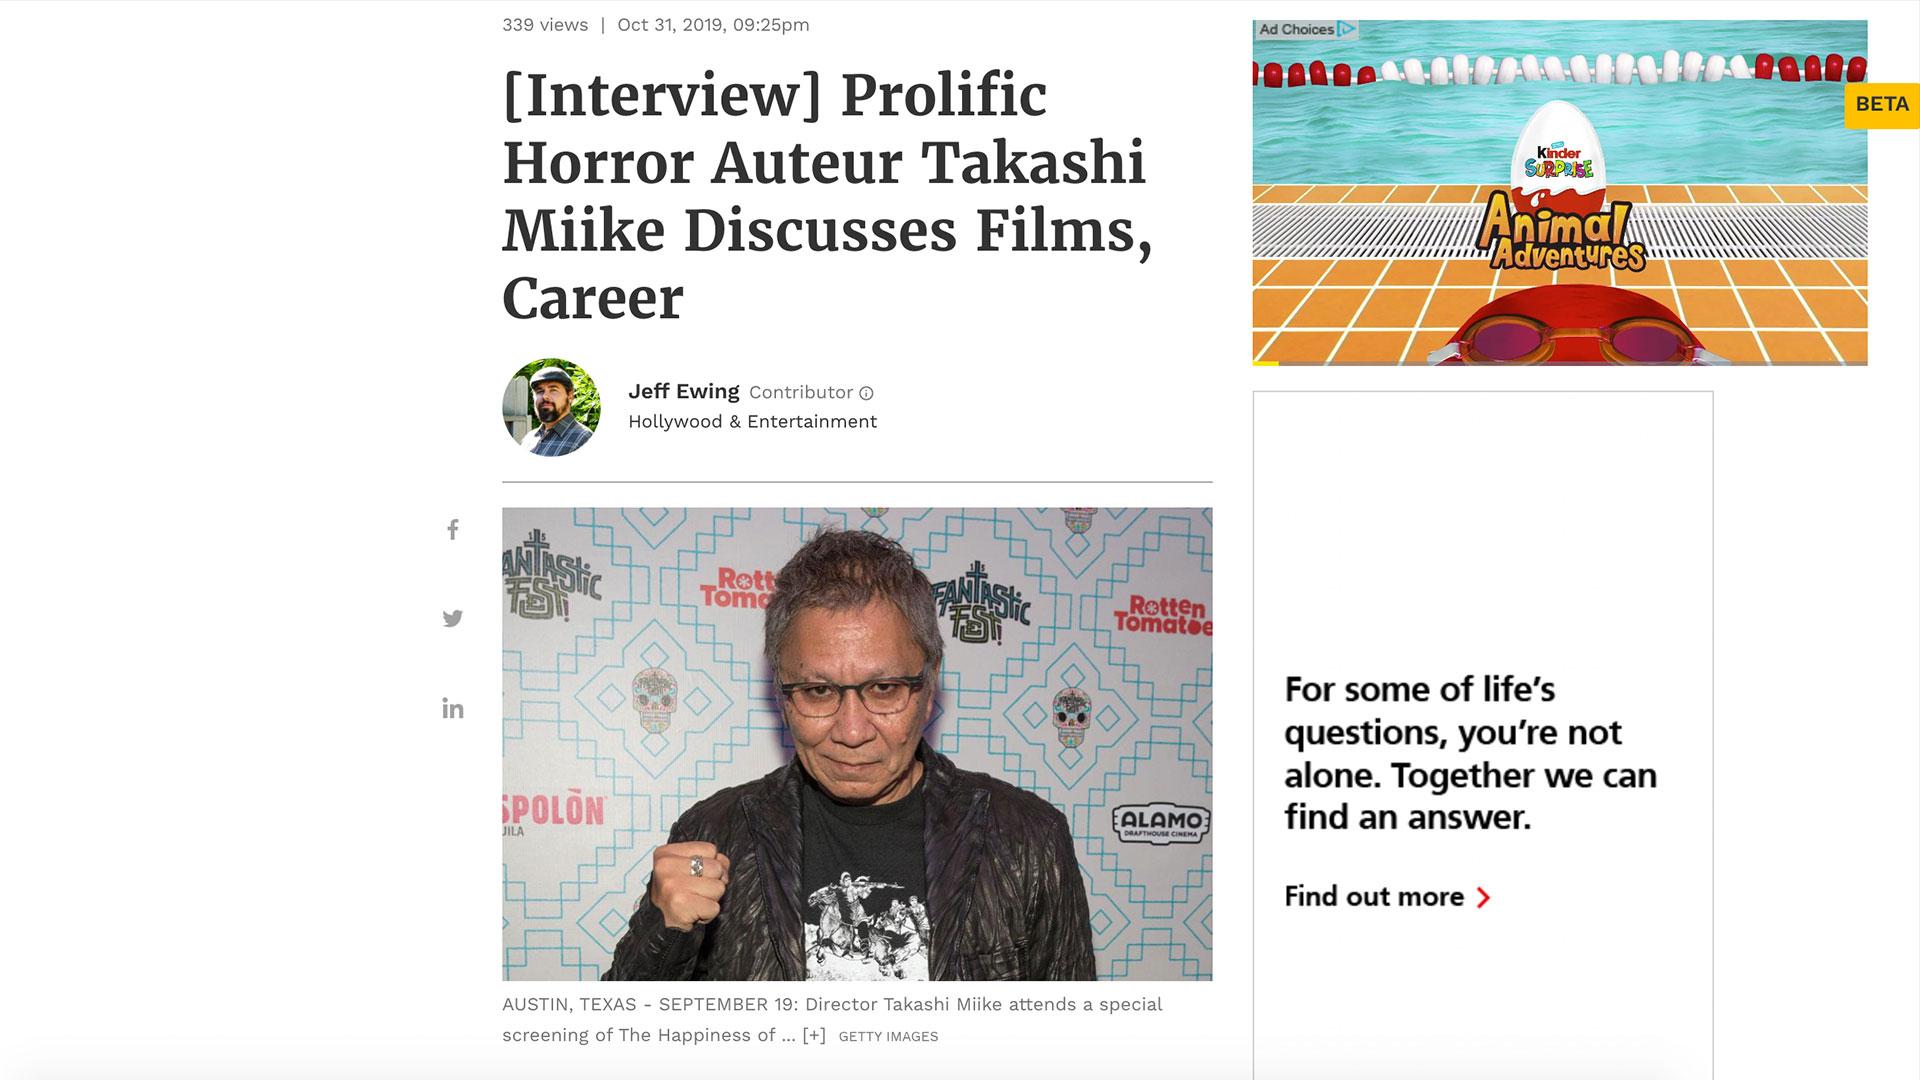 Fairness Rocks News [Interview] Prolific Horror Auteur Takashi Miike Discusses Films, Career